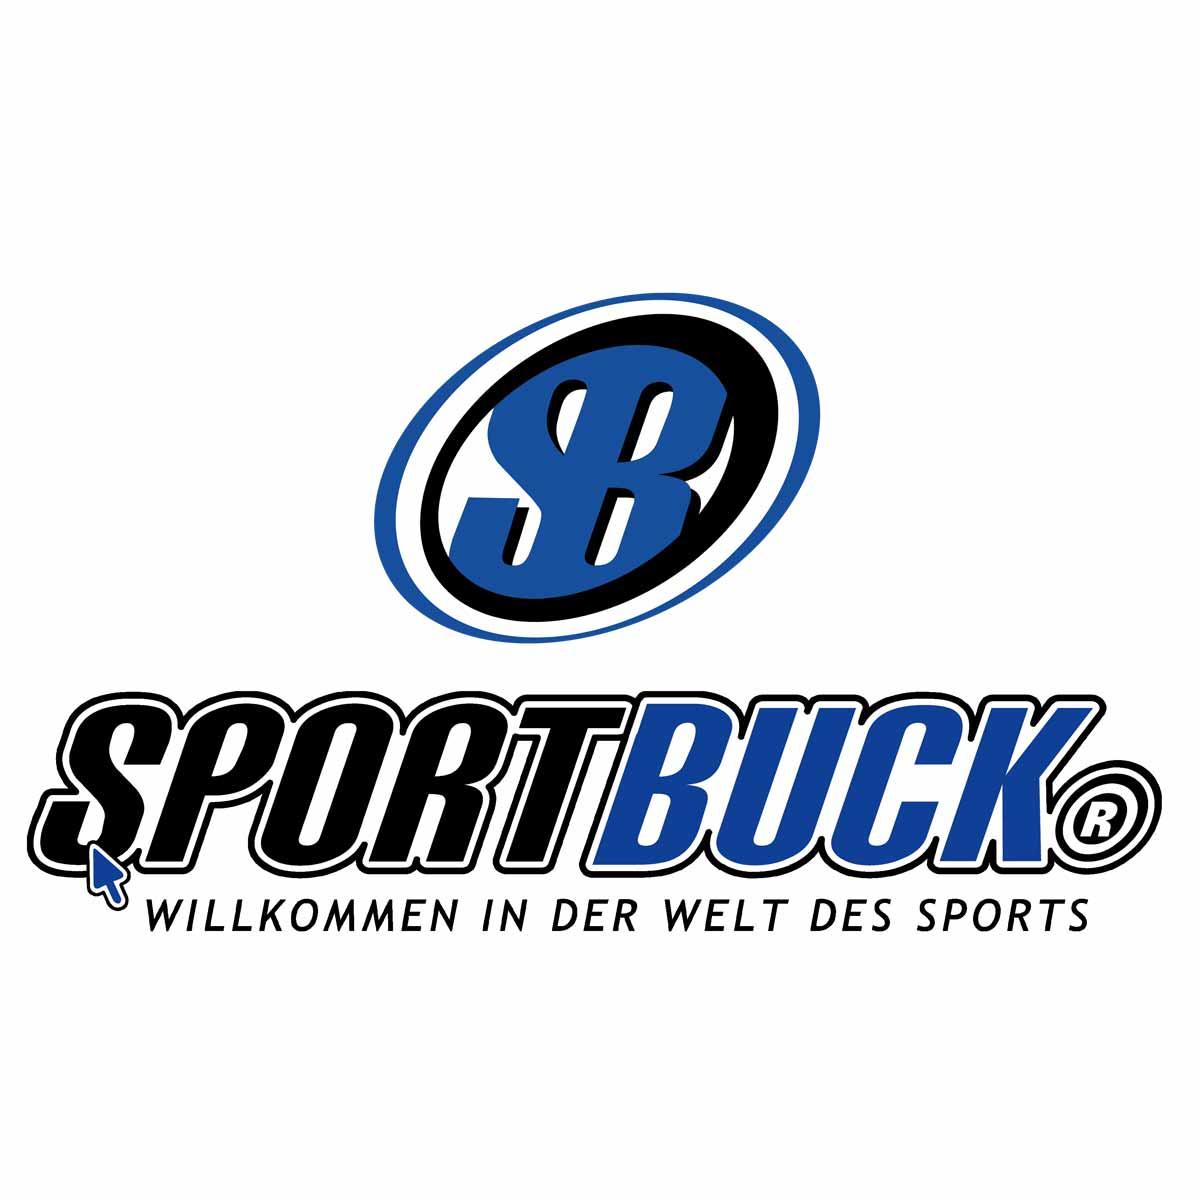 Whey Isolate 94 Molkenproteinisolat Eiweißpulver 425g Vanille - Mindesthaltbarkeitsdatum 05/2022